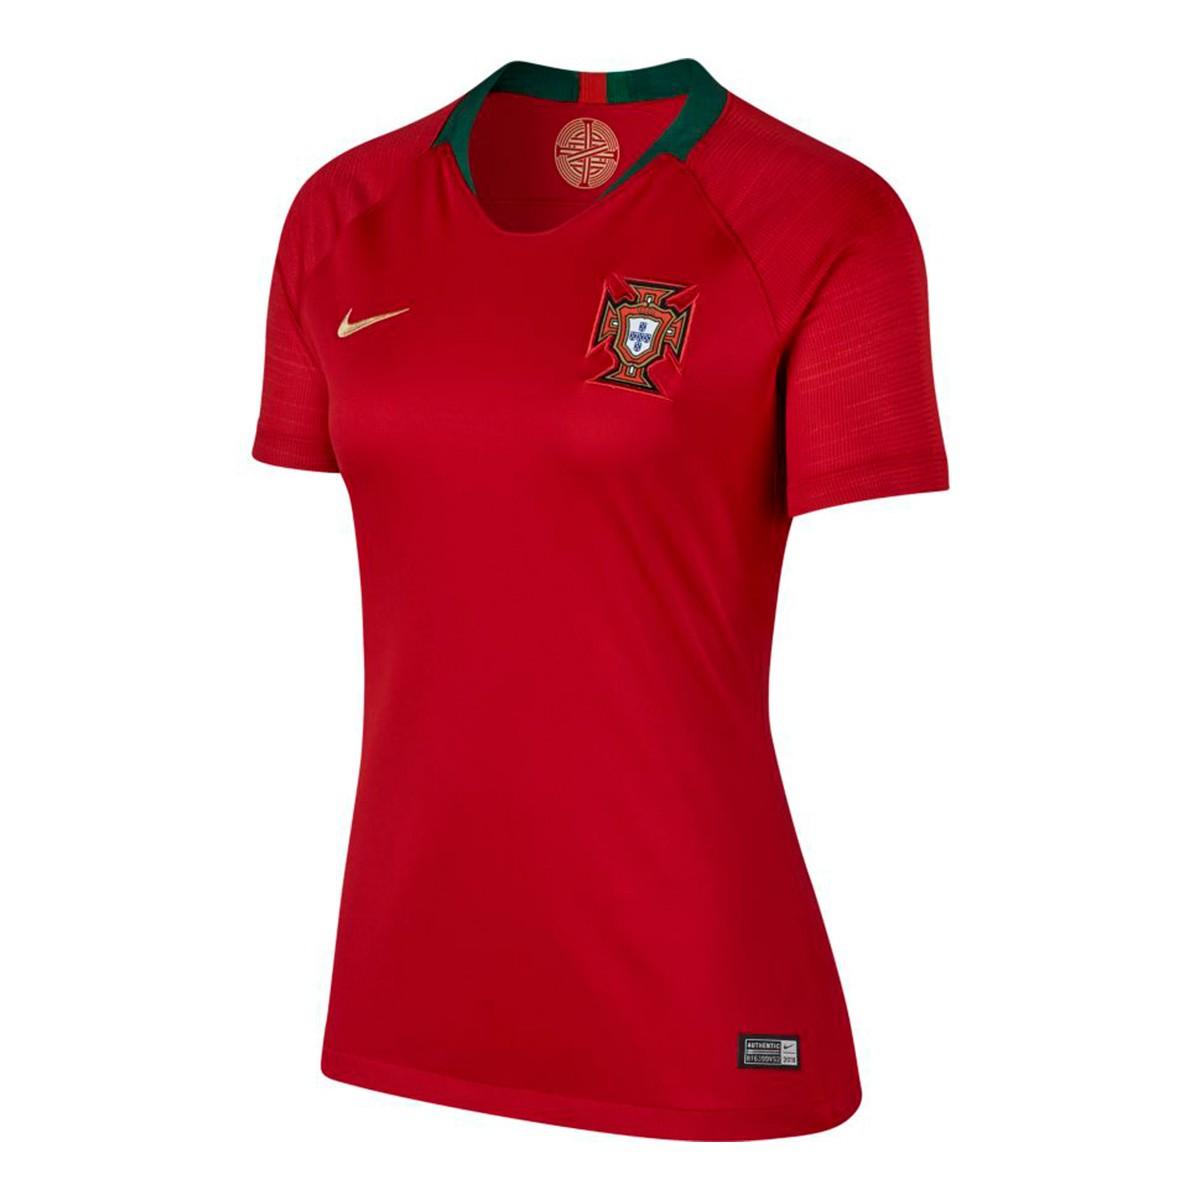 Camiseta Nike Portugal Breathe Stadium Primera Equipación 2018 2019 Mujer